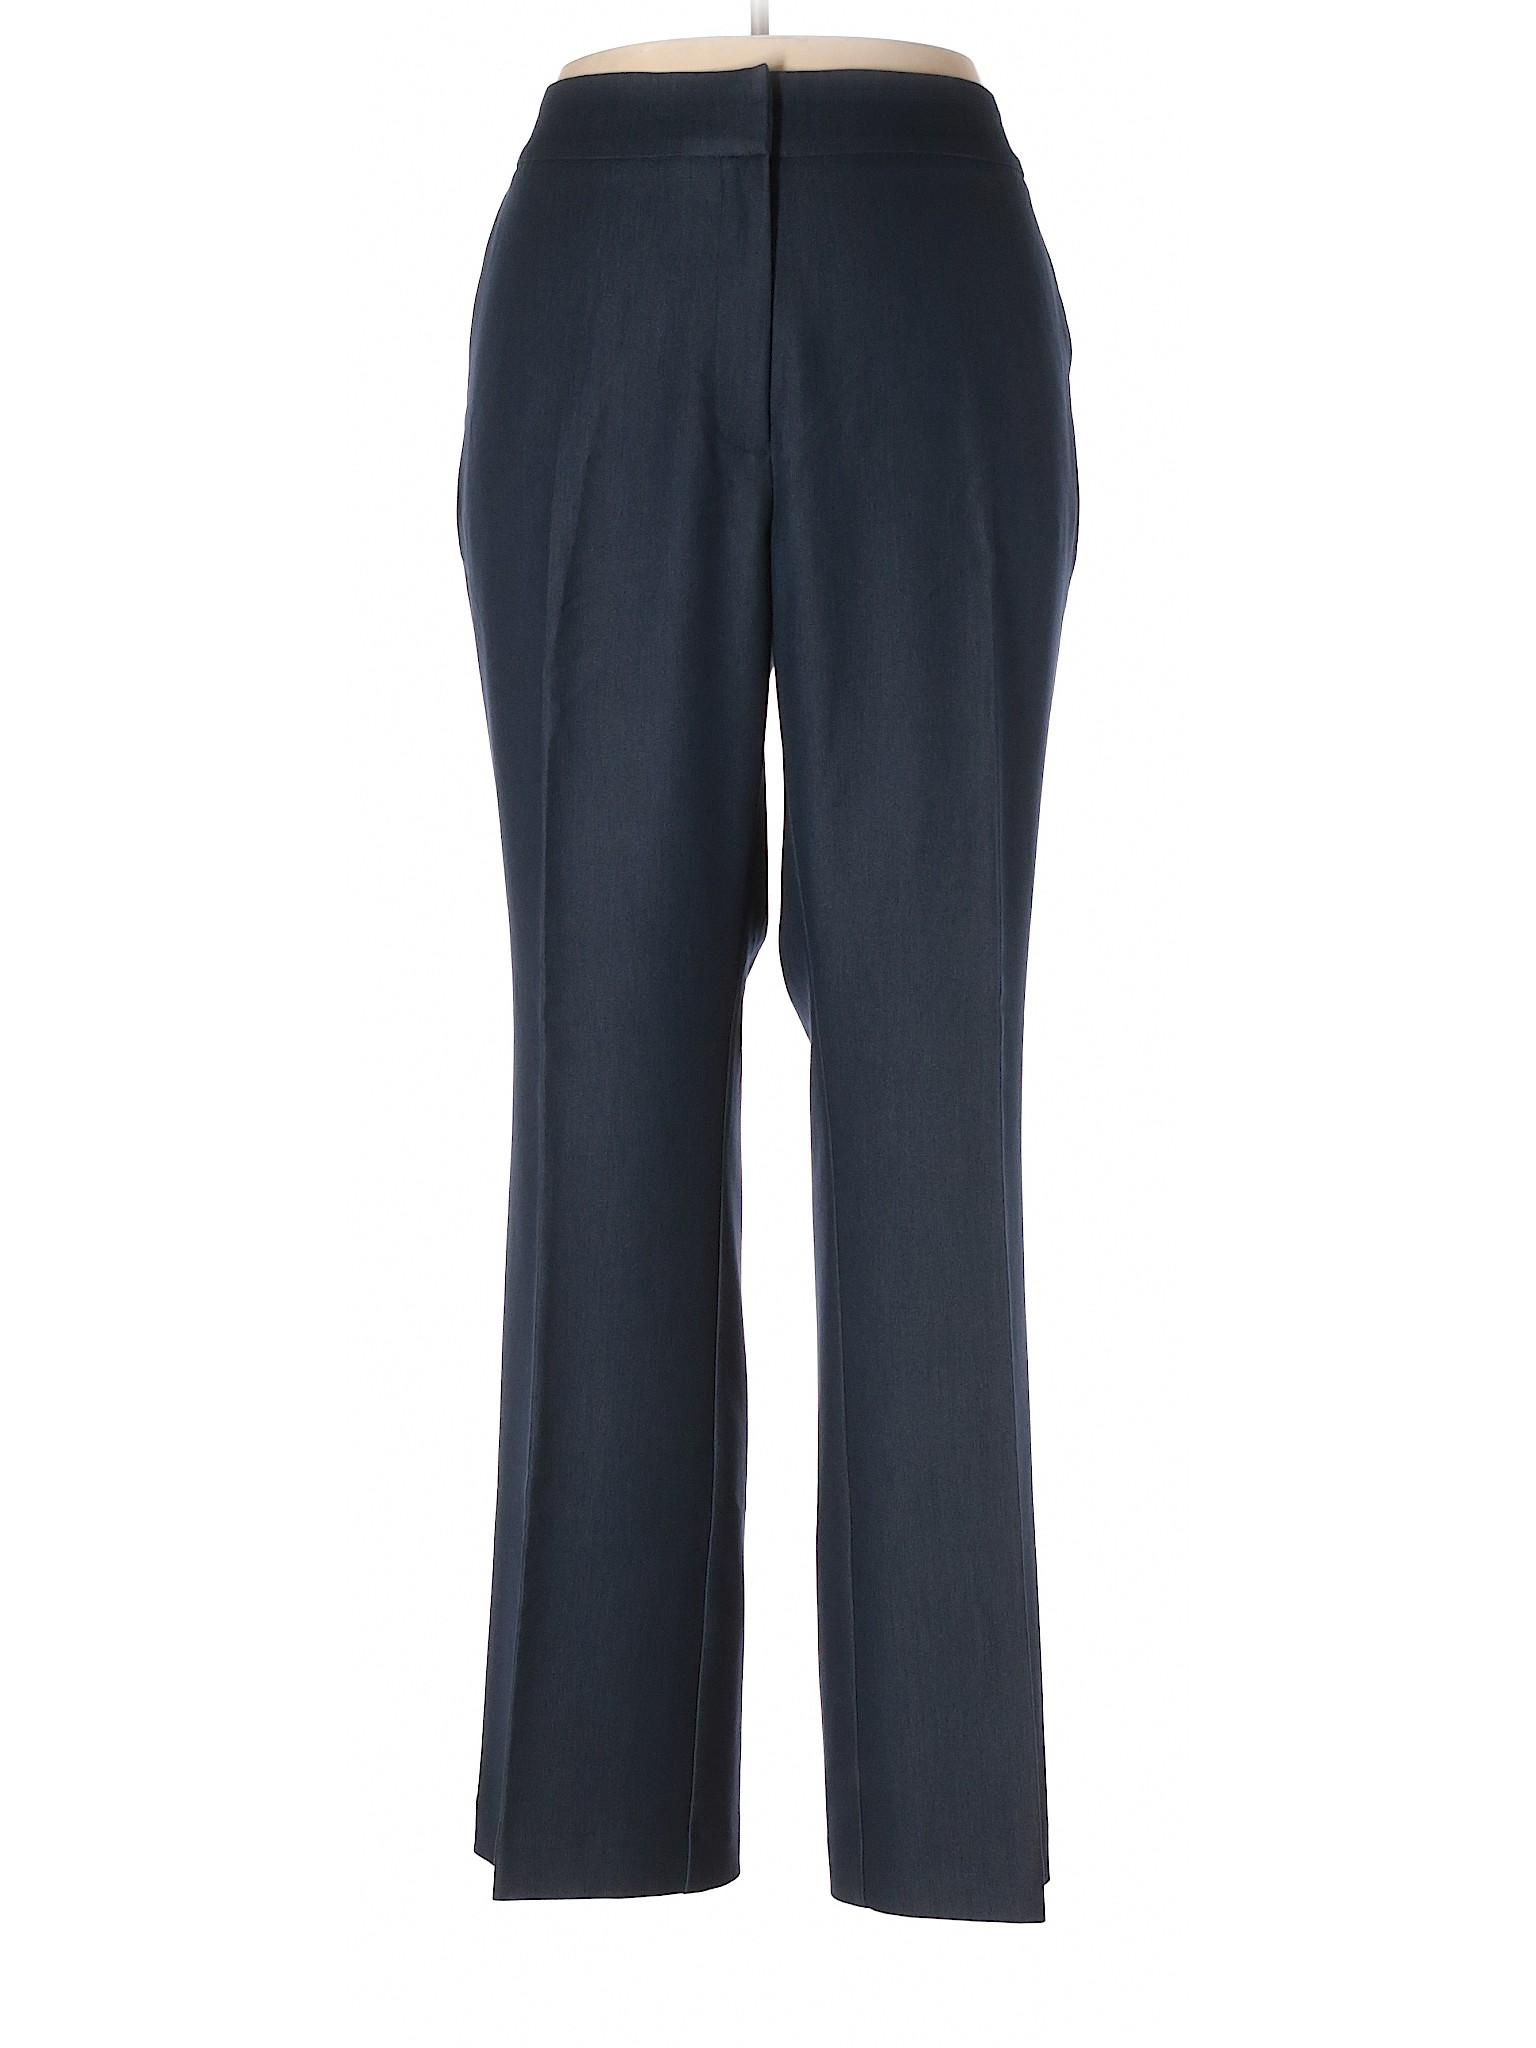 Dress Pants winter Simonton Leisure Says pOWqx7xtw